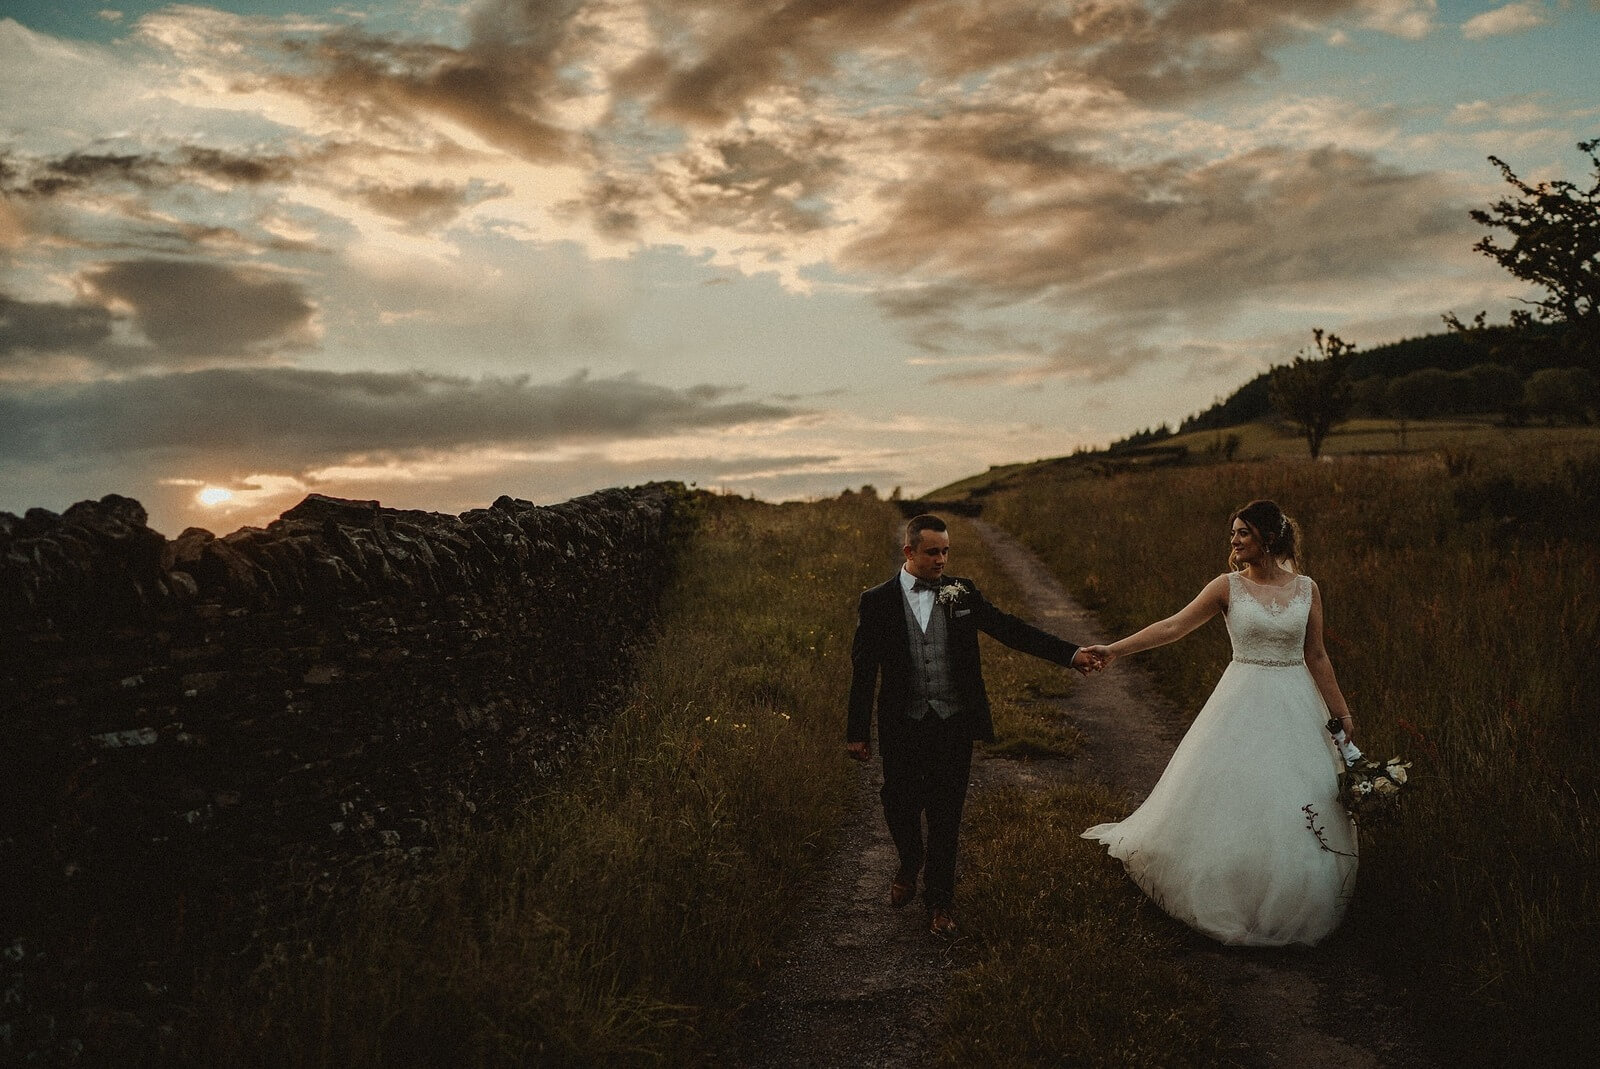 Bride and Groom Countryside Wedding Photo